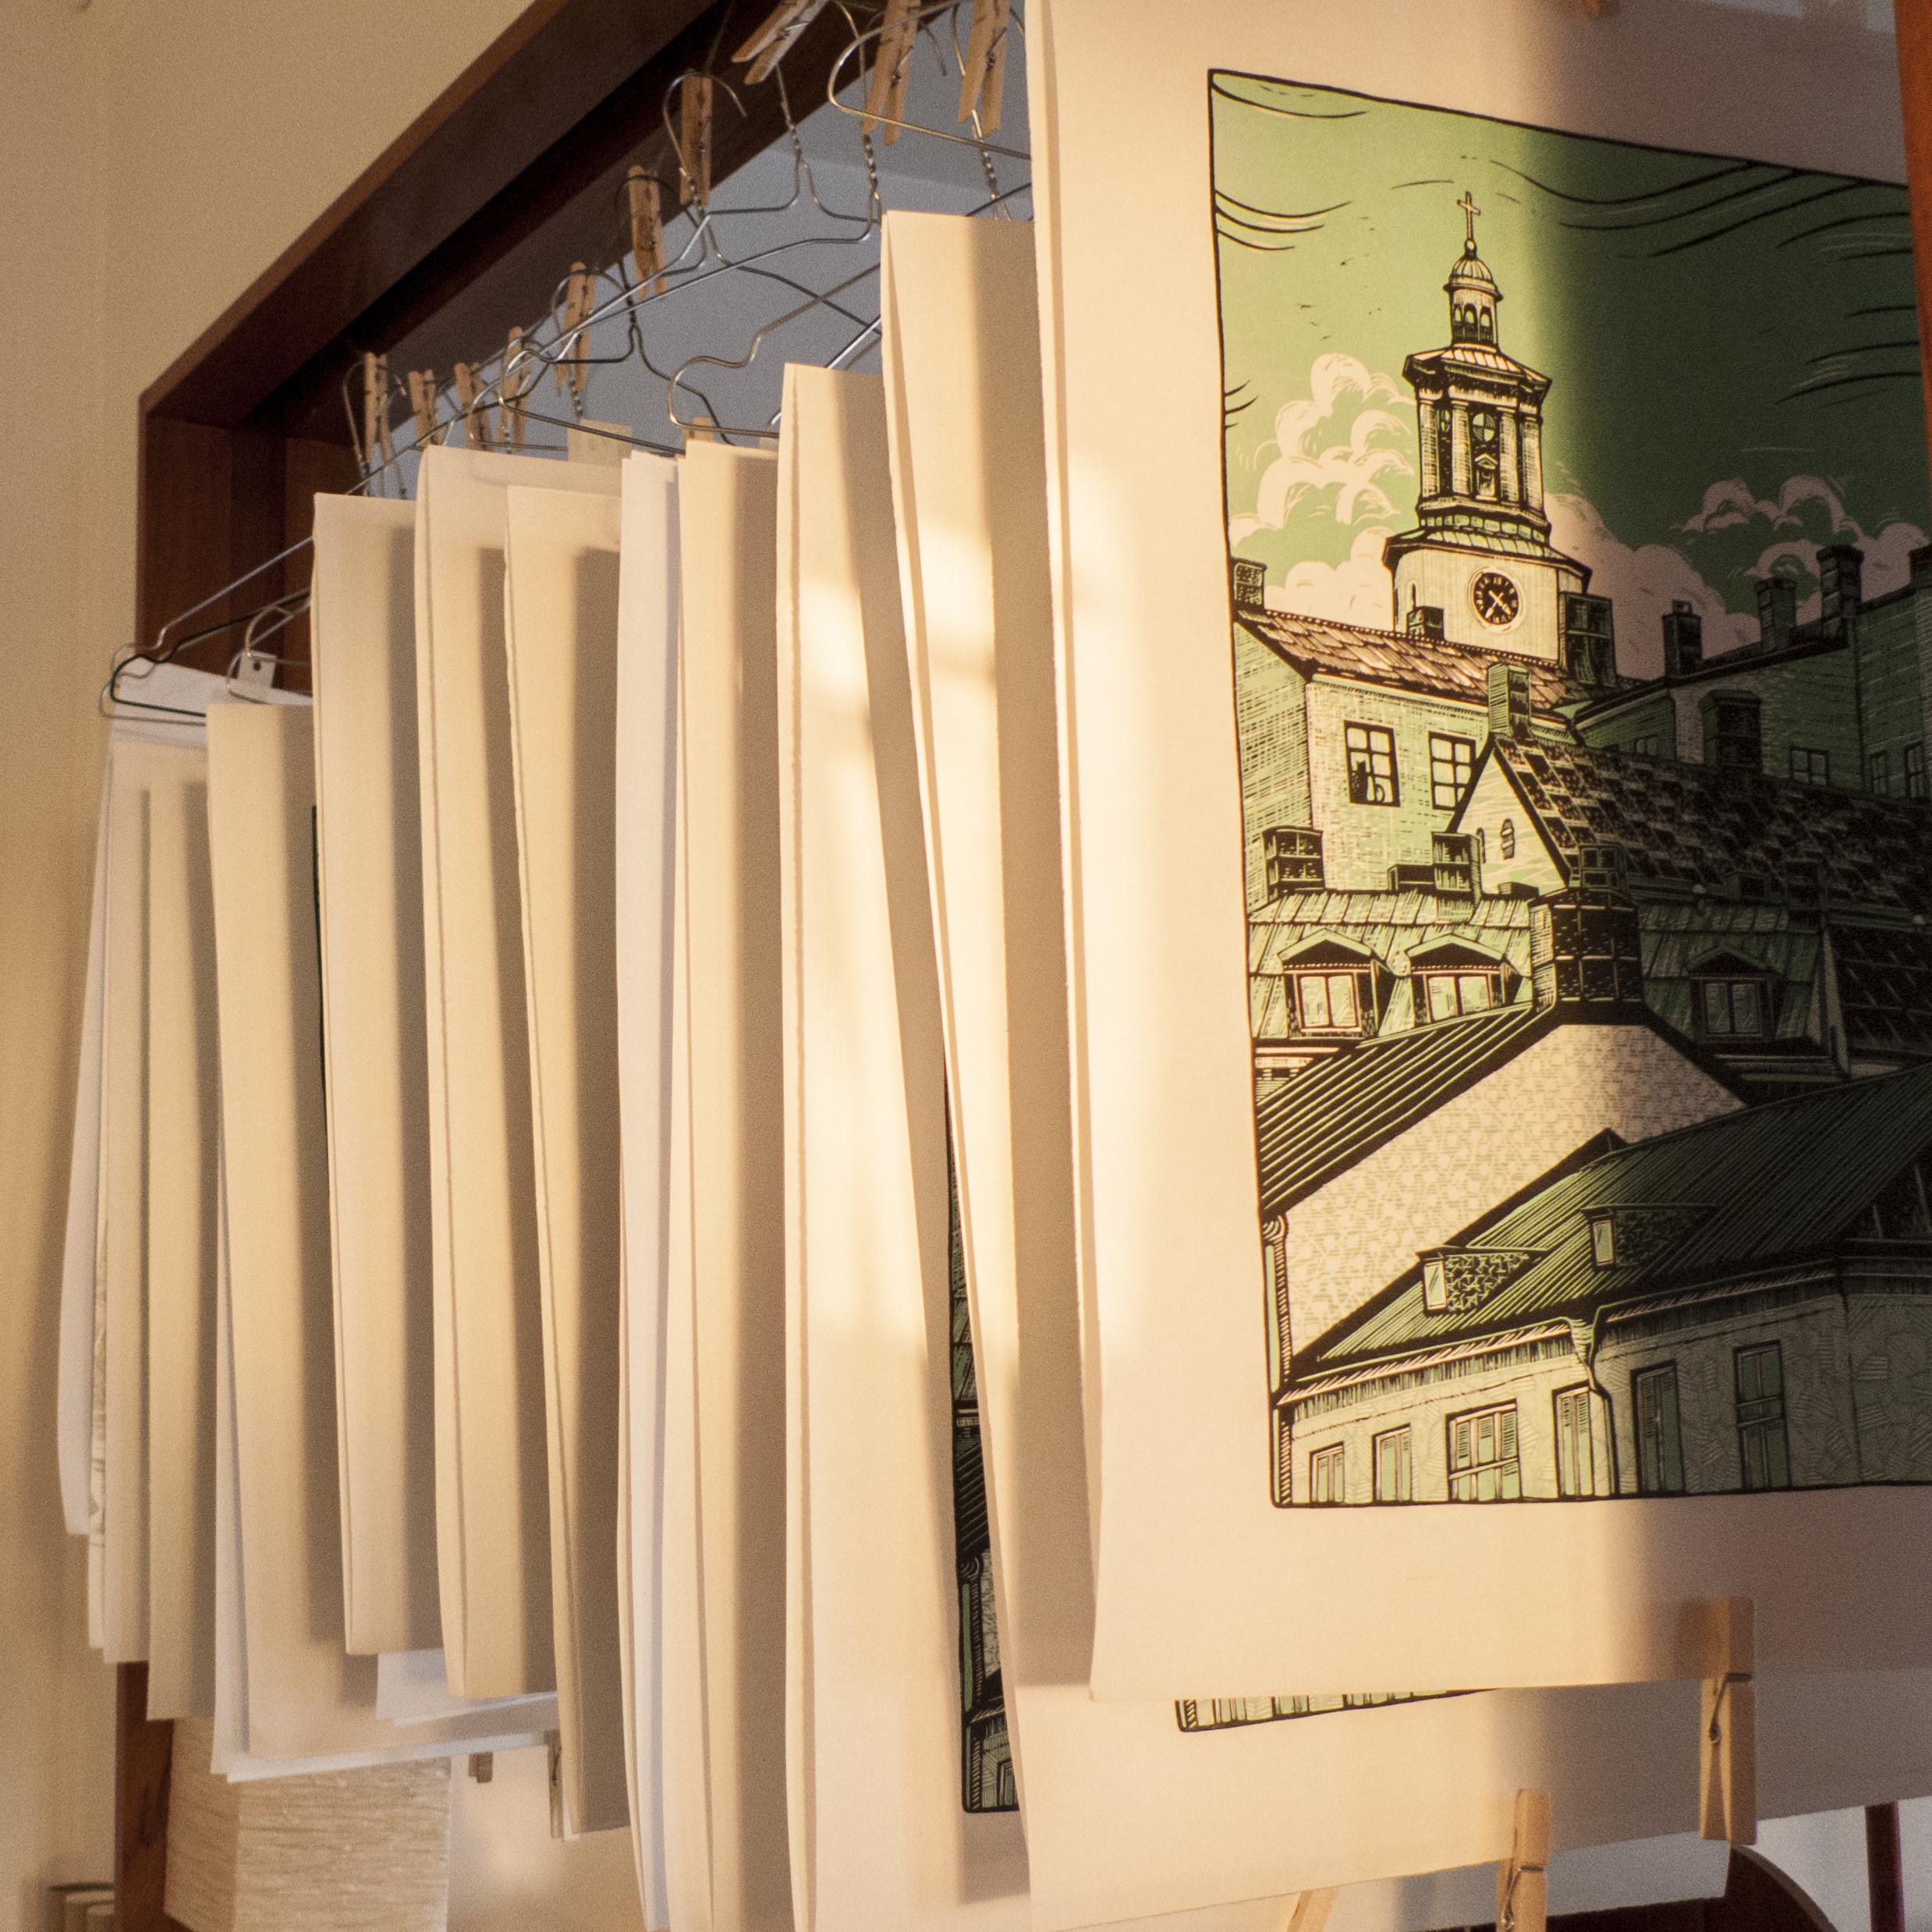 st-maria-magdalena-kyrka-linocut-drying.jpg